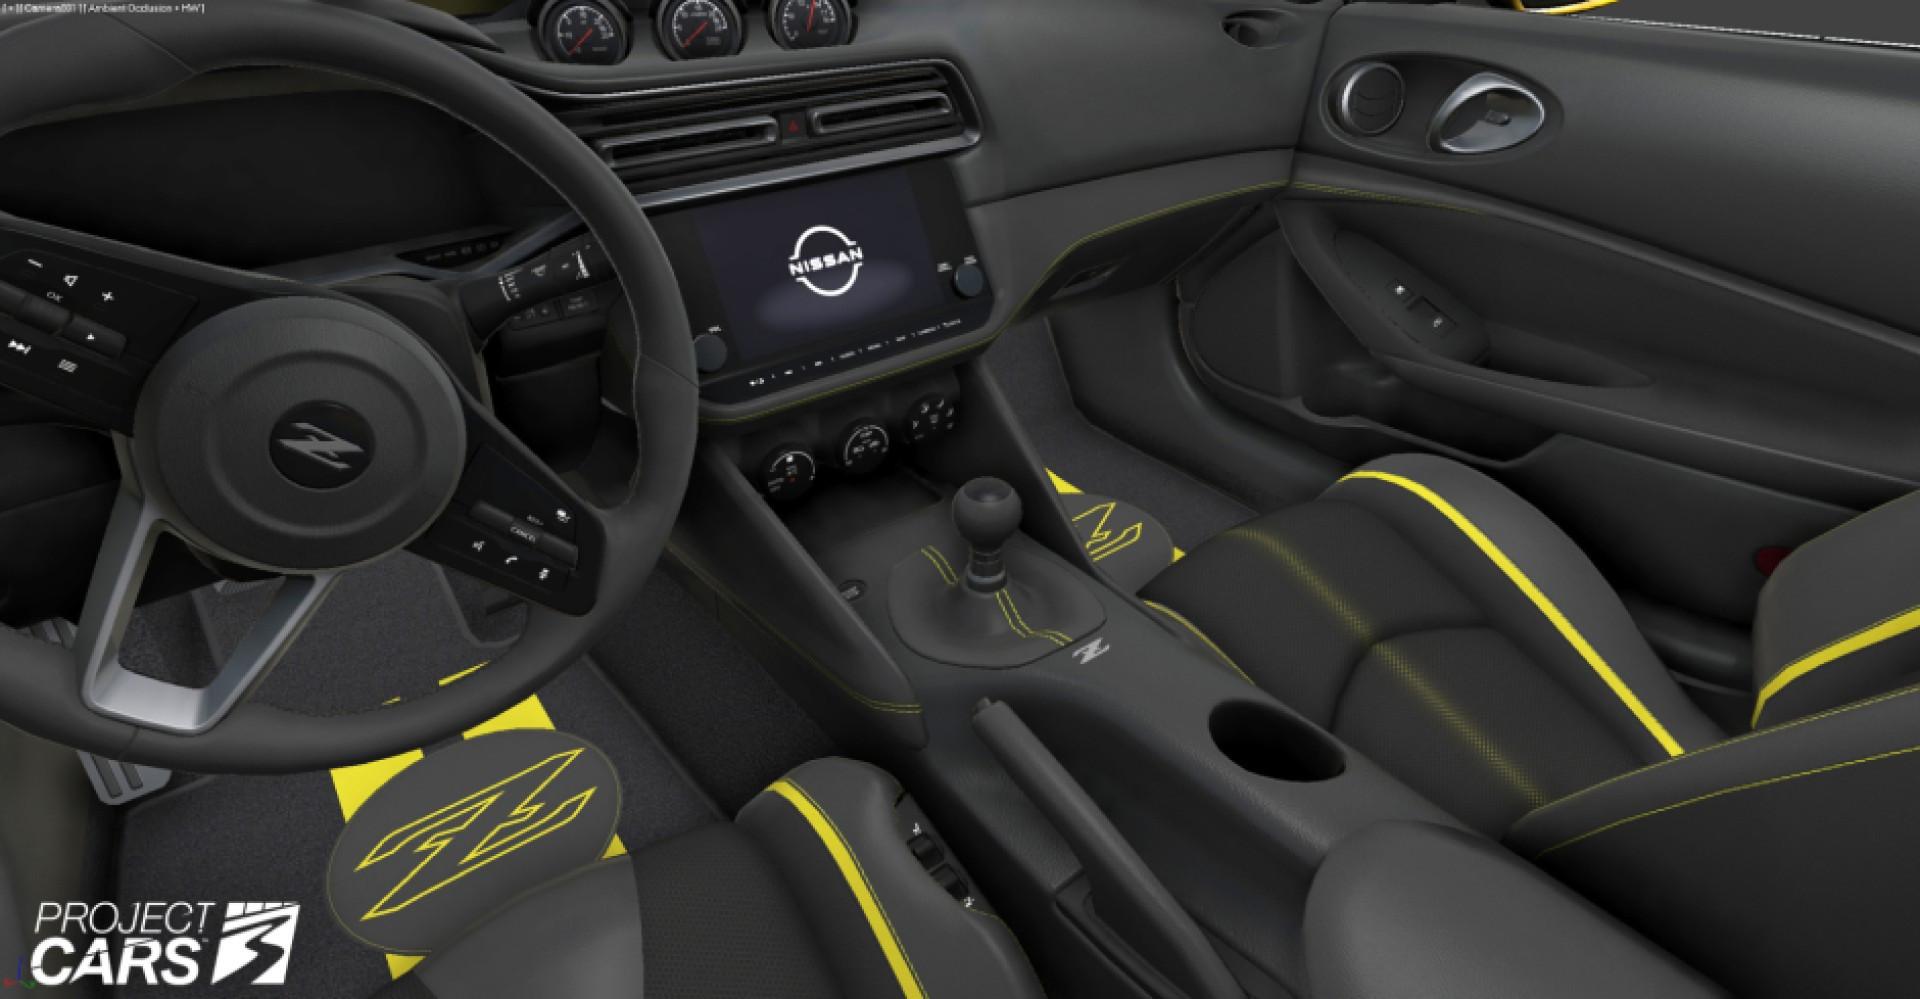 Projet CARS 3: Power Pack DLC